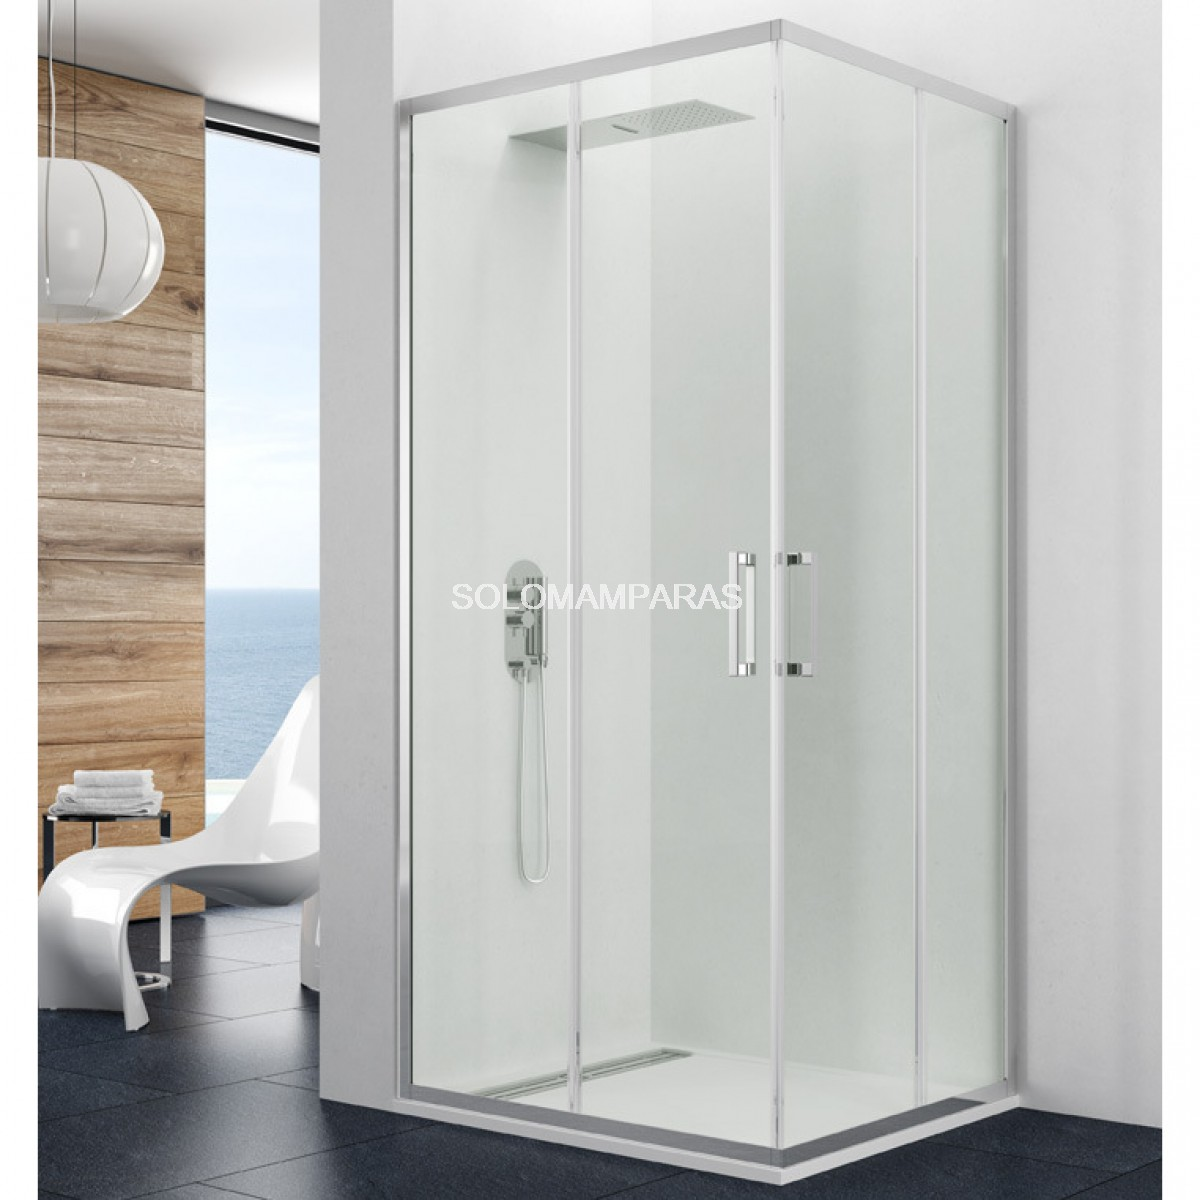 Mampara de ducha gme prestige angular 2 fijas 2 correderas - Mamparas ducha correderas ...